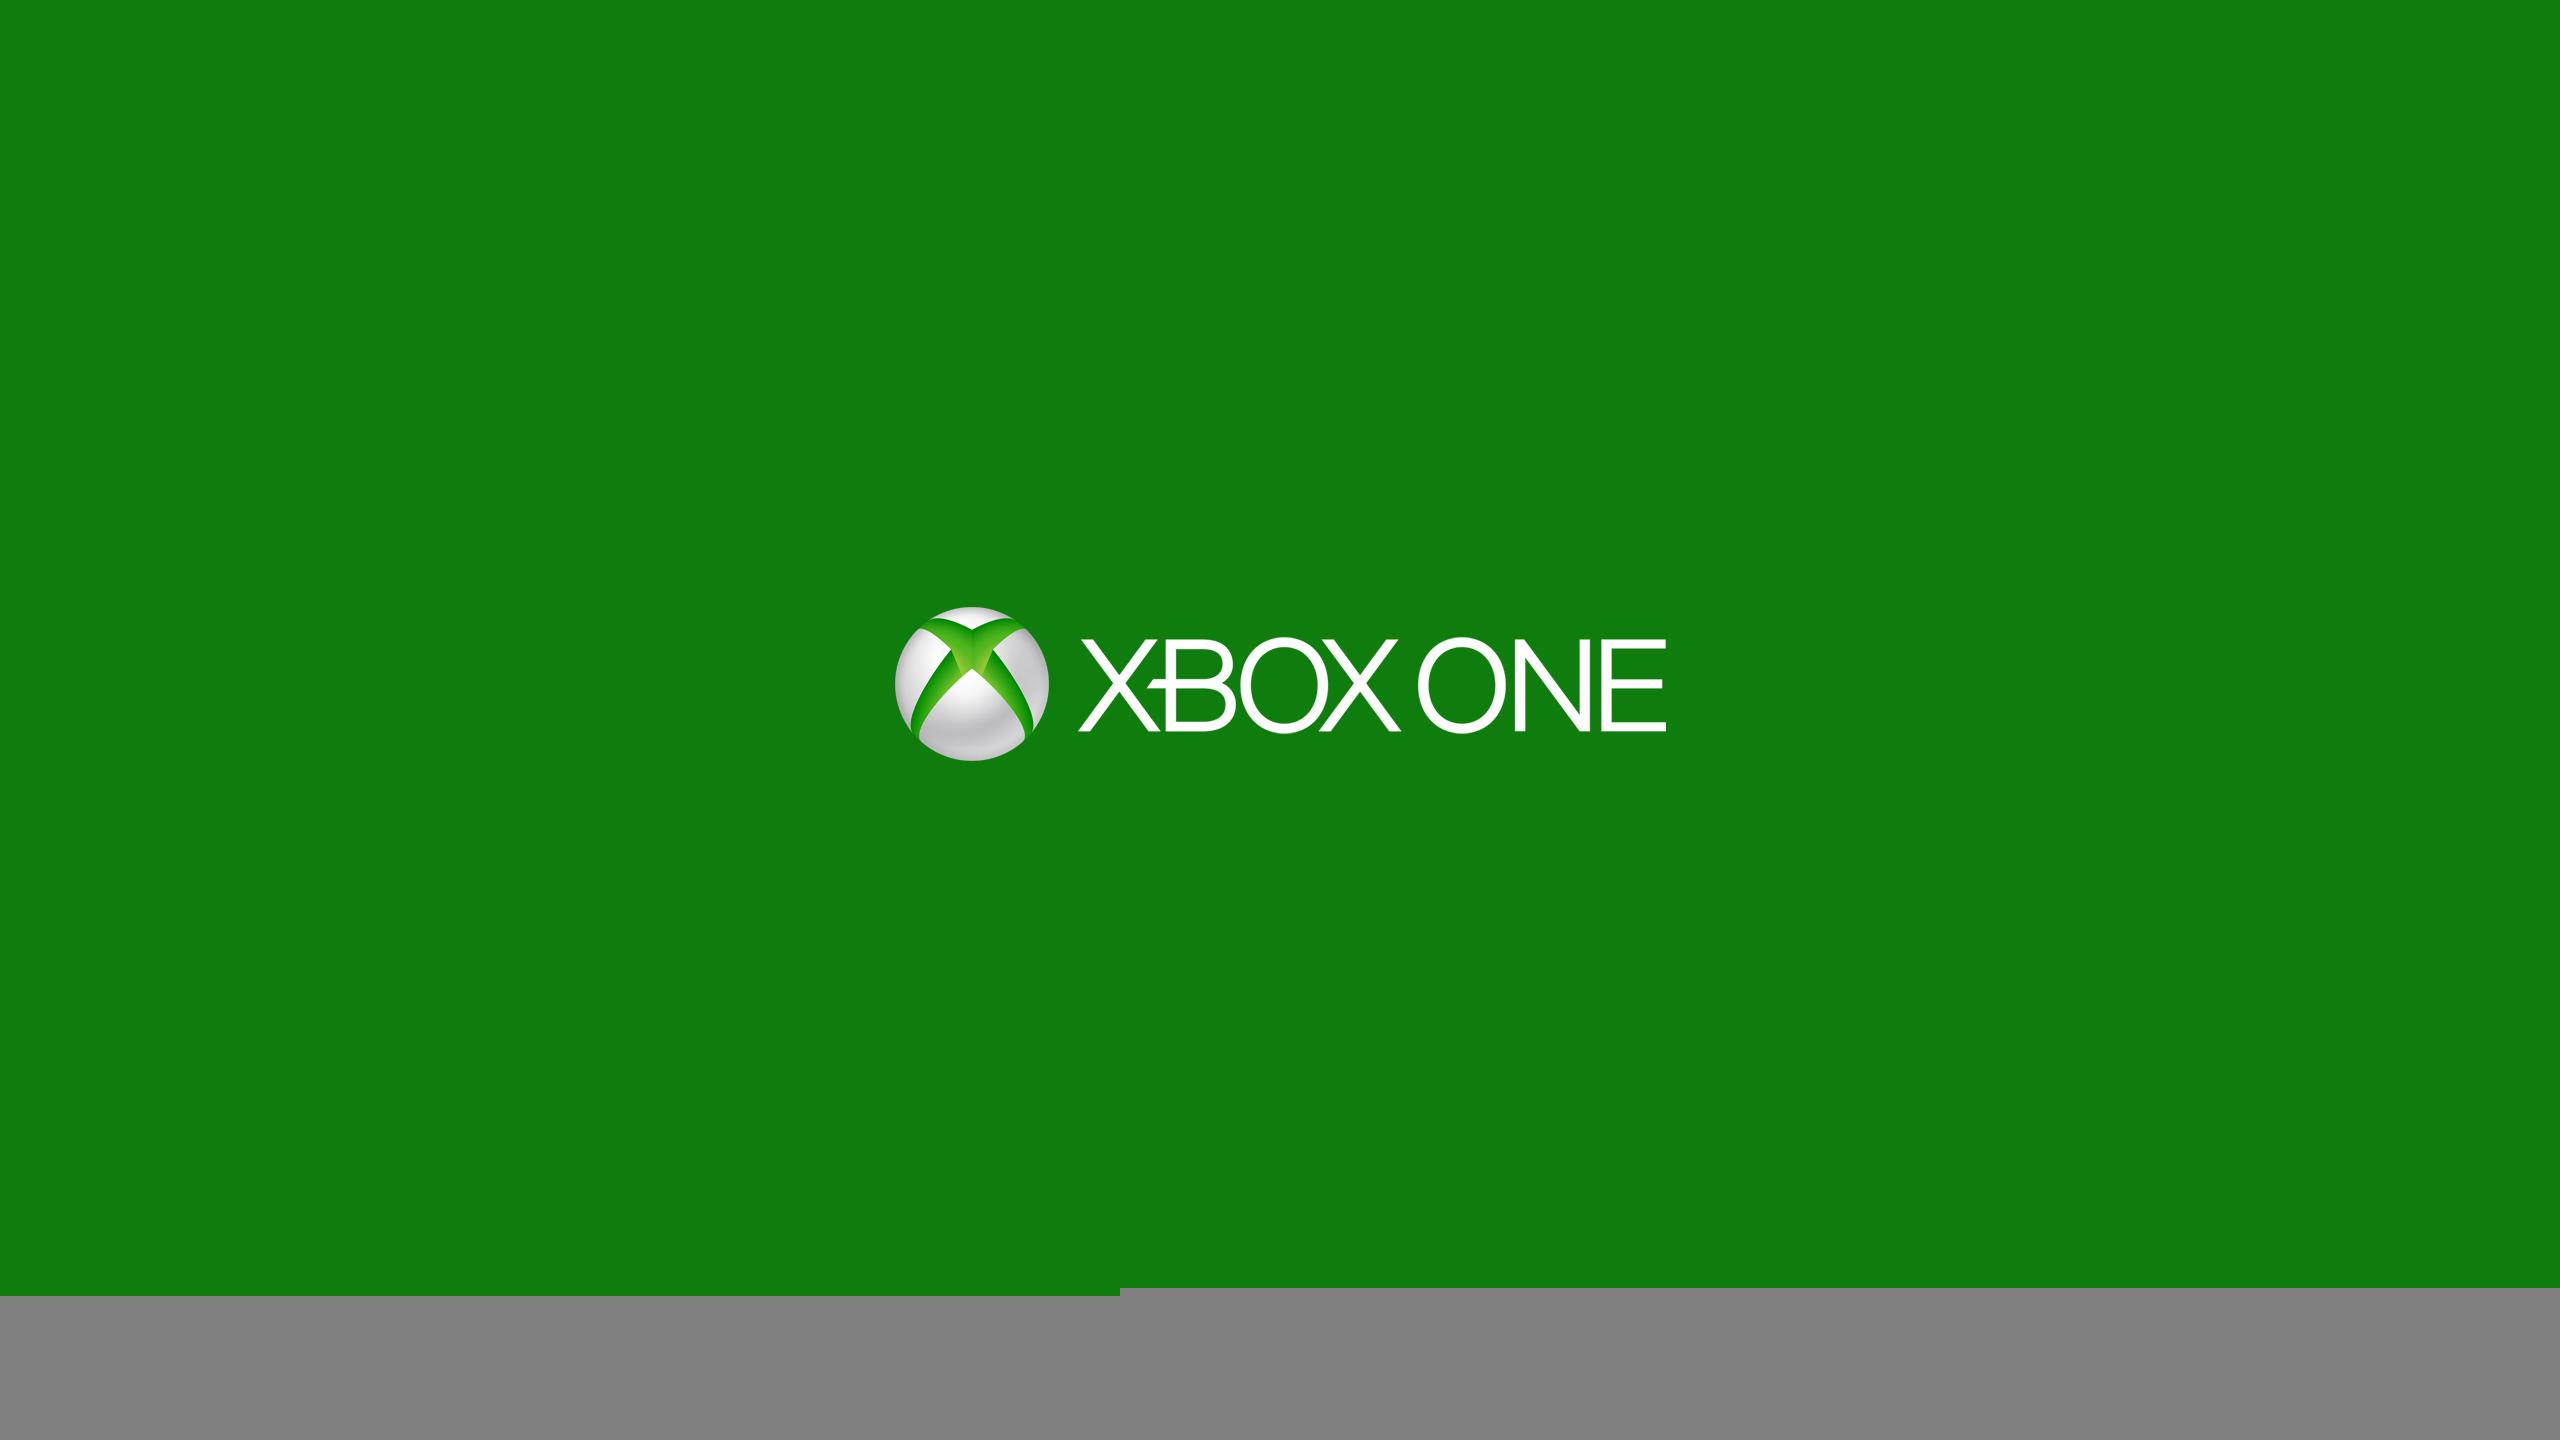 Xbox One Logo Green